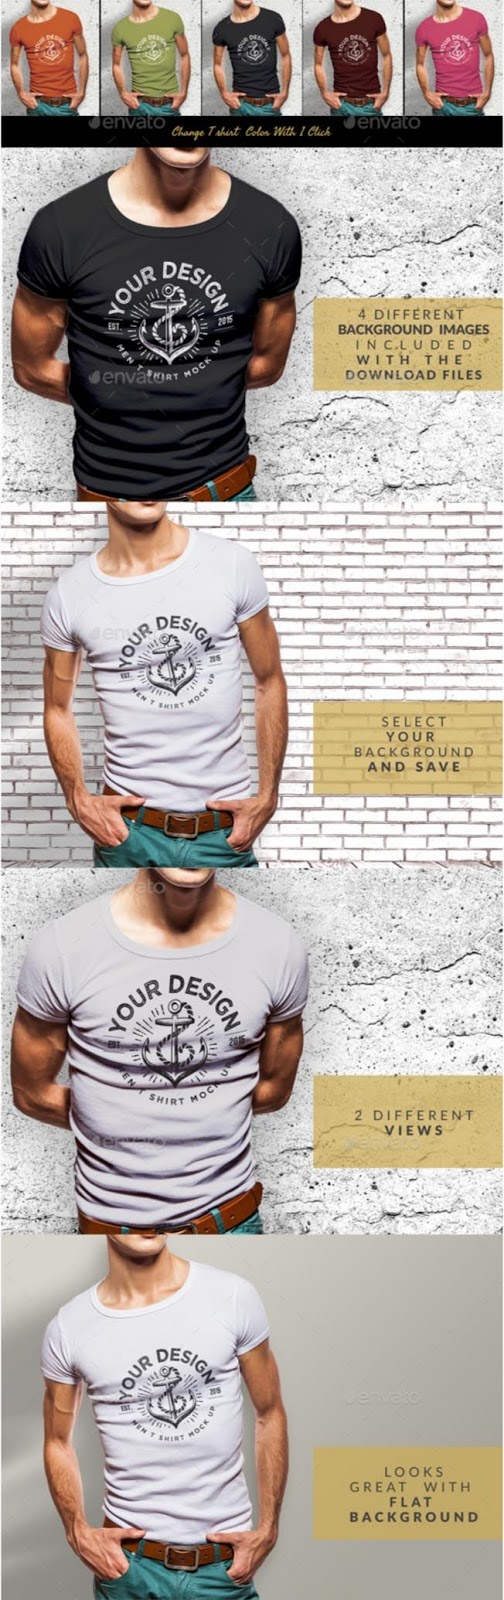 25. Muscular Men T-Shirt Mockup